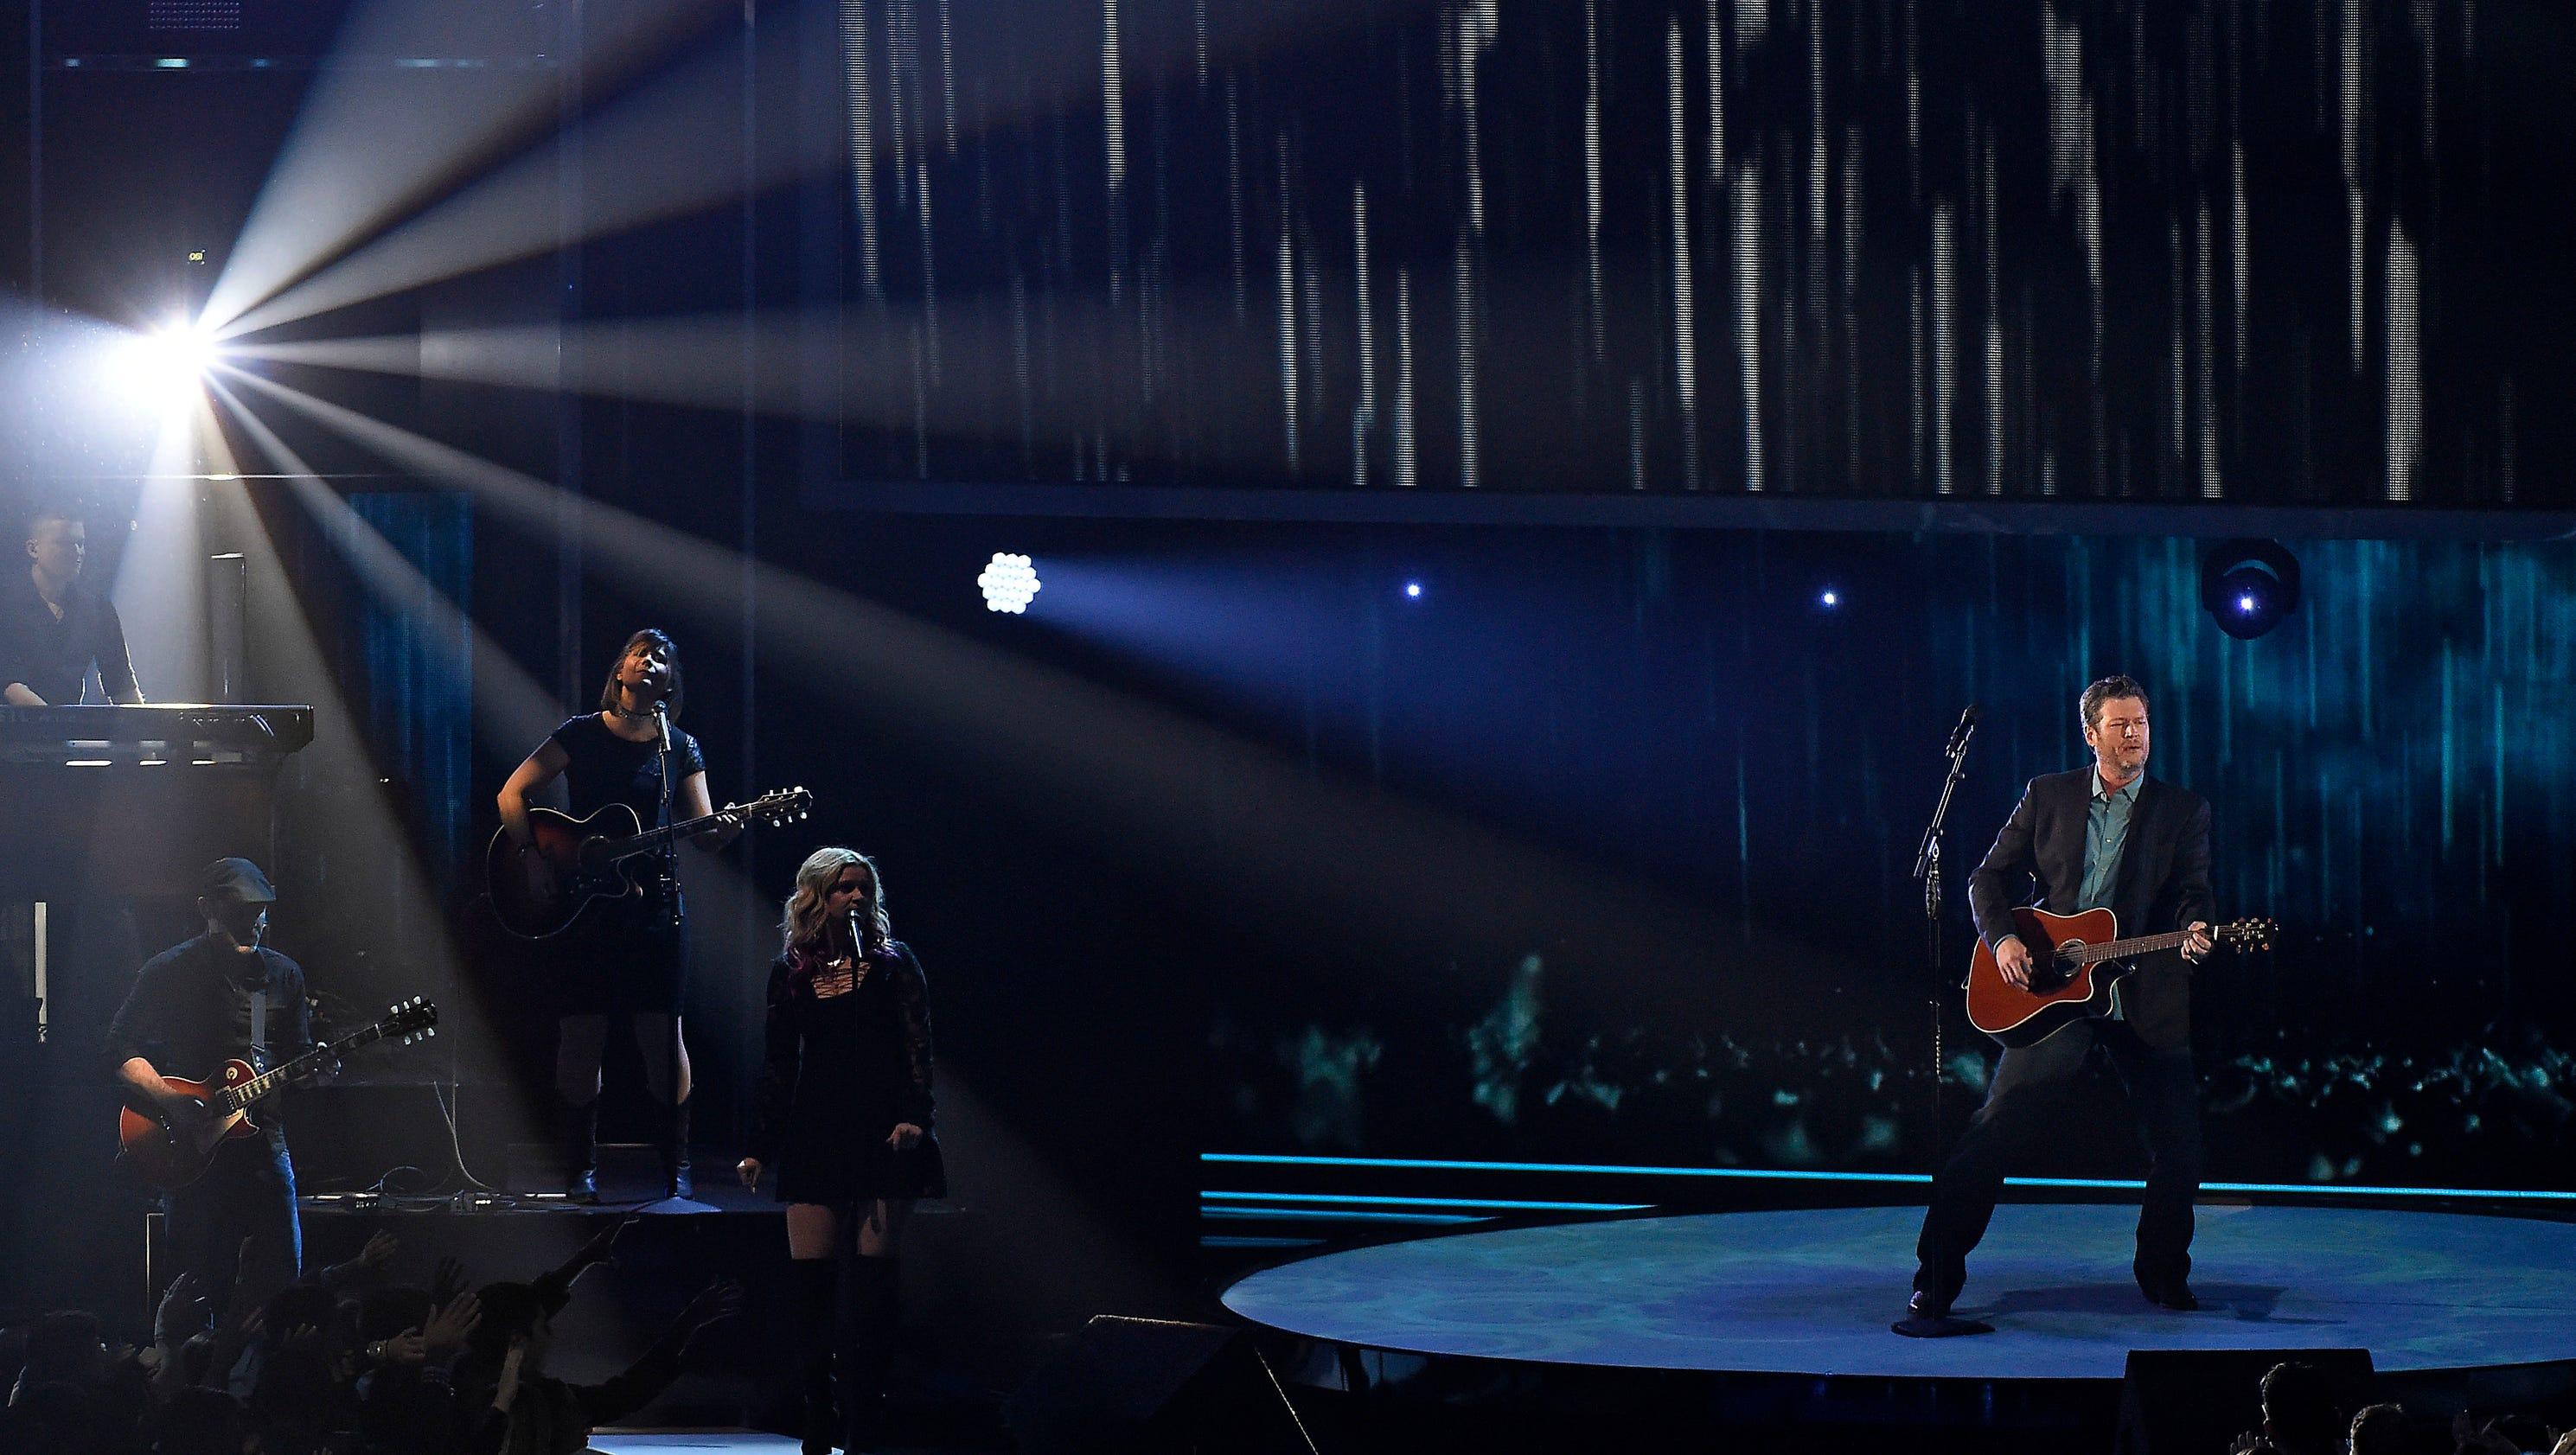 Blake Shelton has historic win at People's Choice Awards